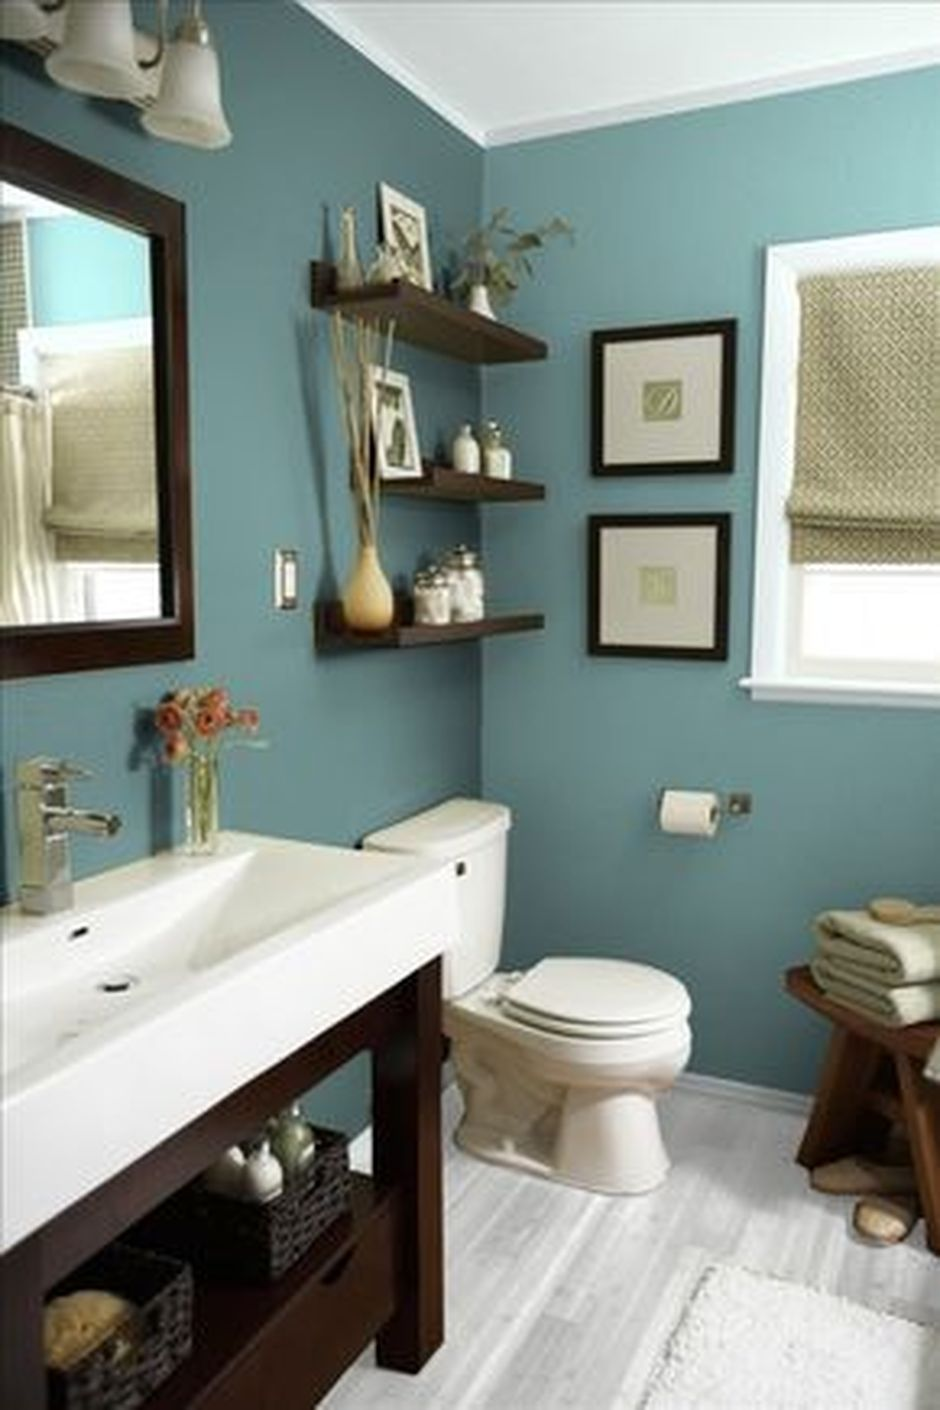 70 Brilliant Hacks Small And Tiny Bathroom Organizations Ideas Hoommy Com In 2020 Best Bathroom Paint Colors Small Bathroom Remodel Painting Bathroom